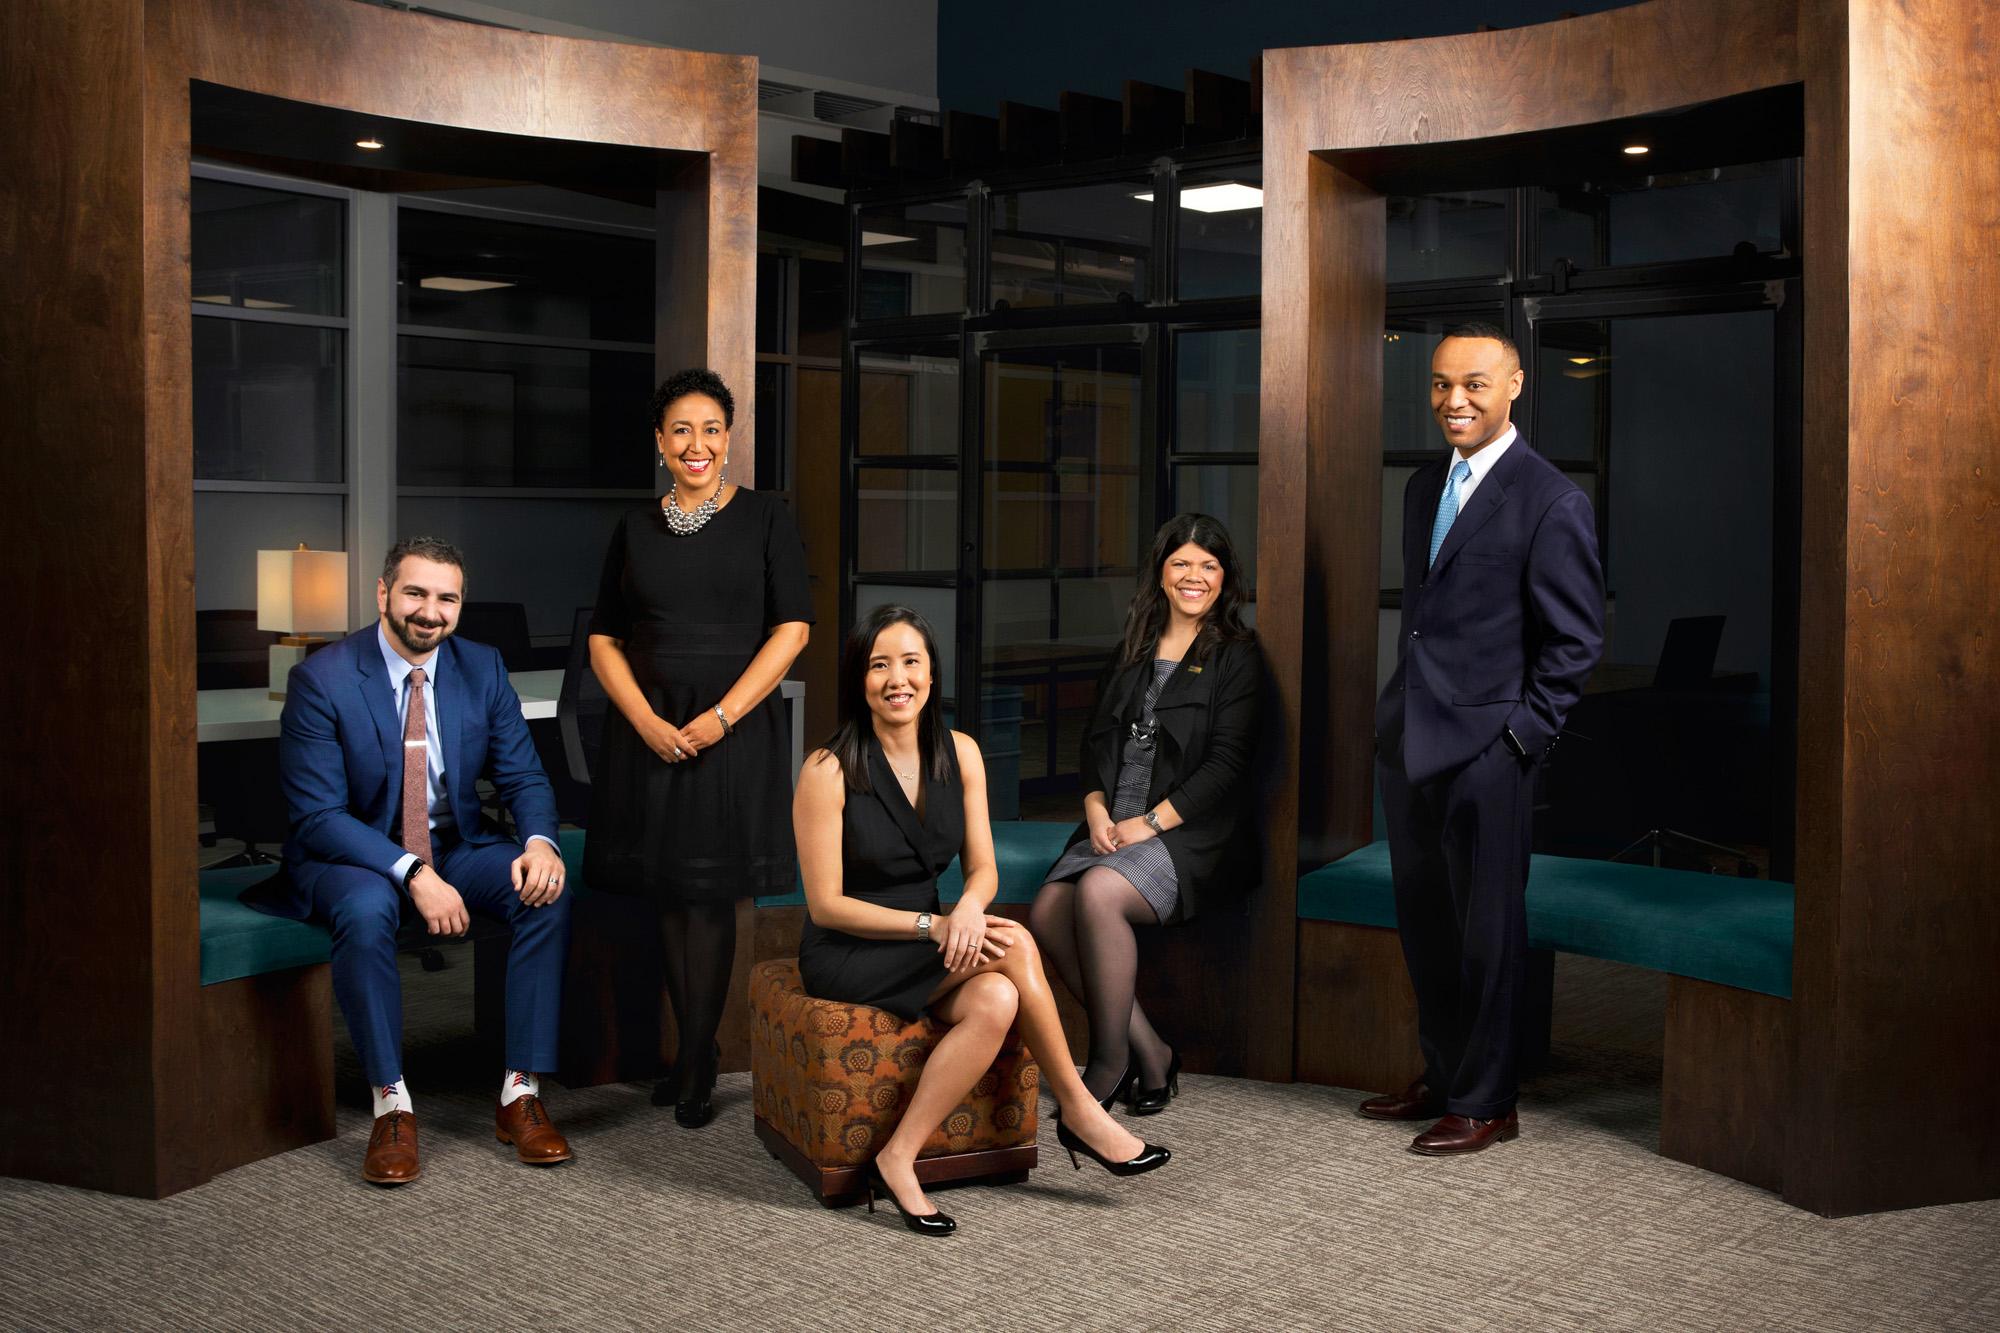 Corporate, Photography, Photoshoot, Group Portrait, The Columbus Foundation, Ua Chamberlain